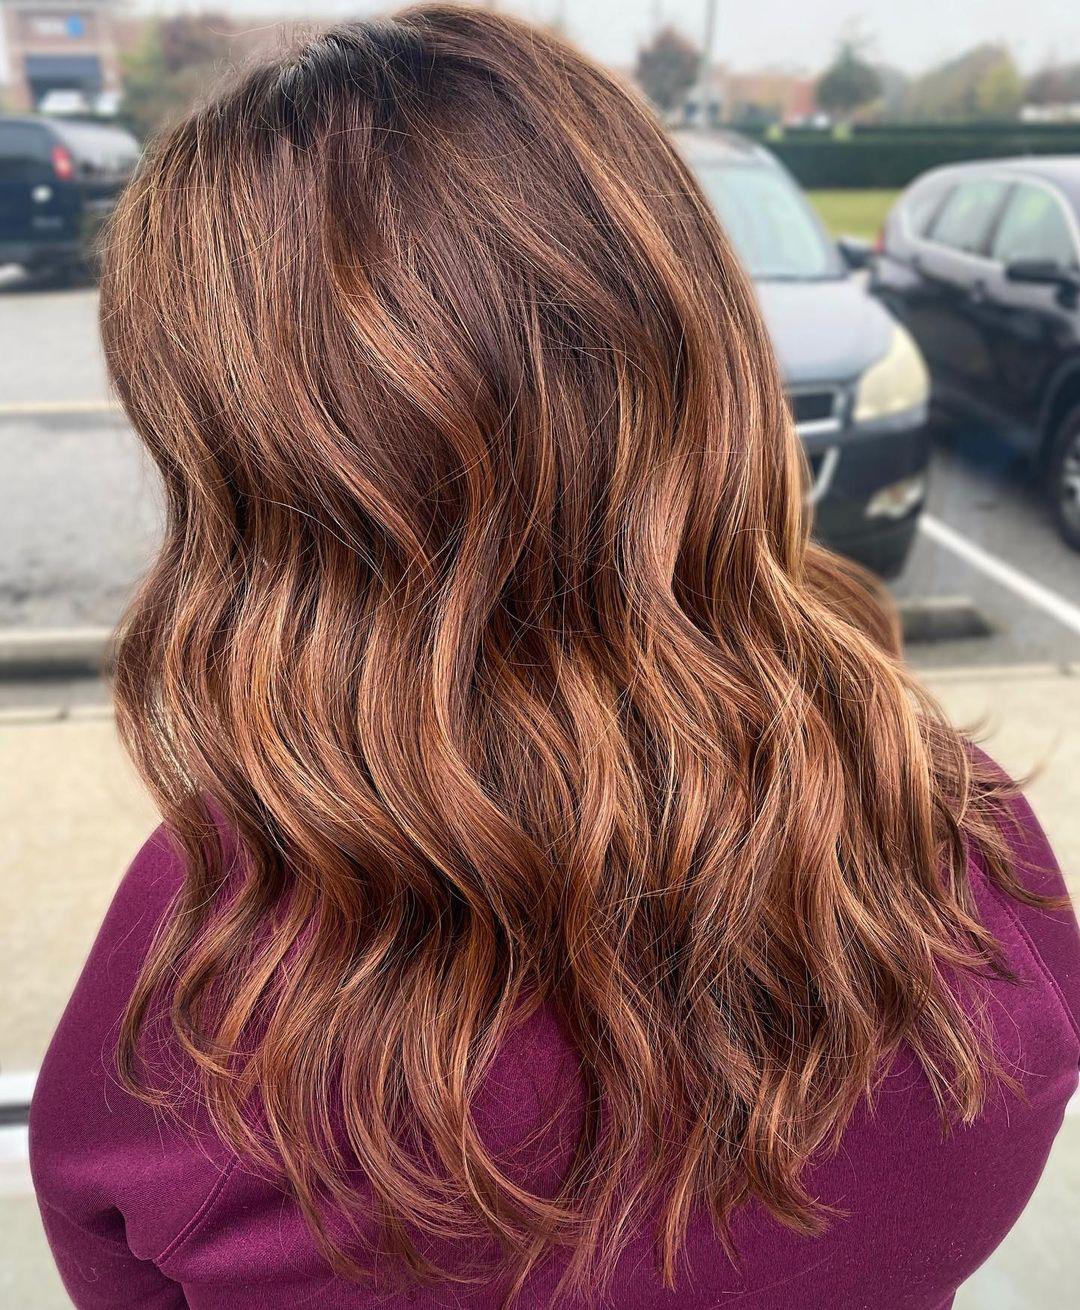 15 Dark Auburn Hair Color Ideas Trending in 15